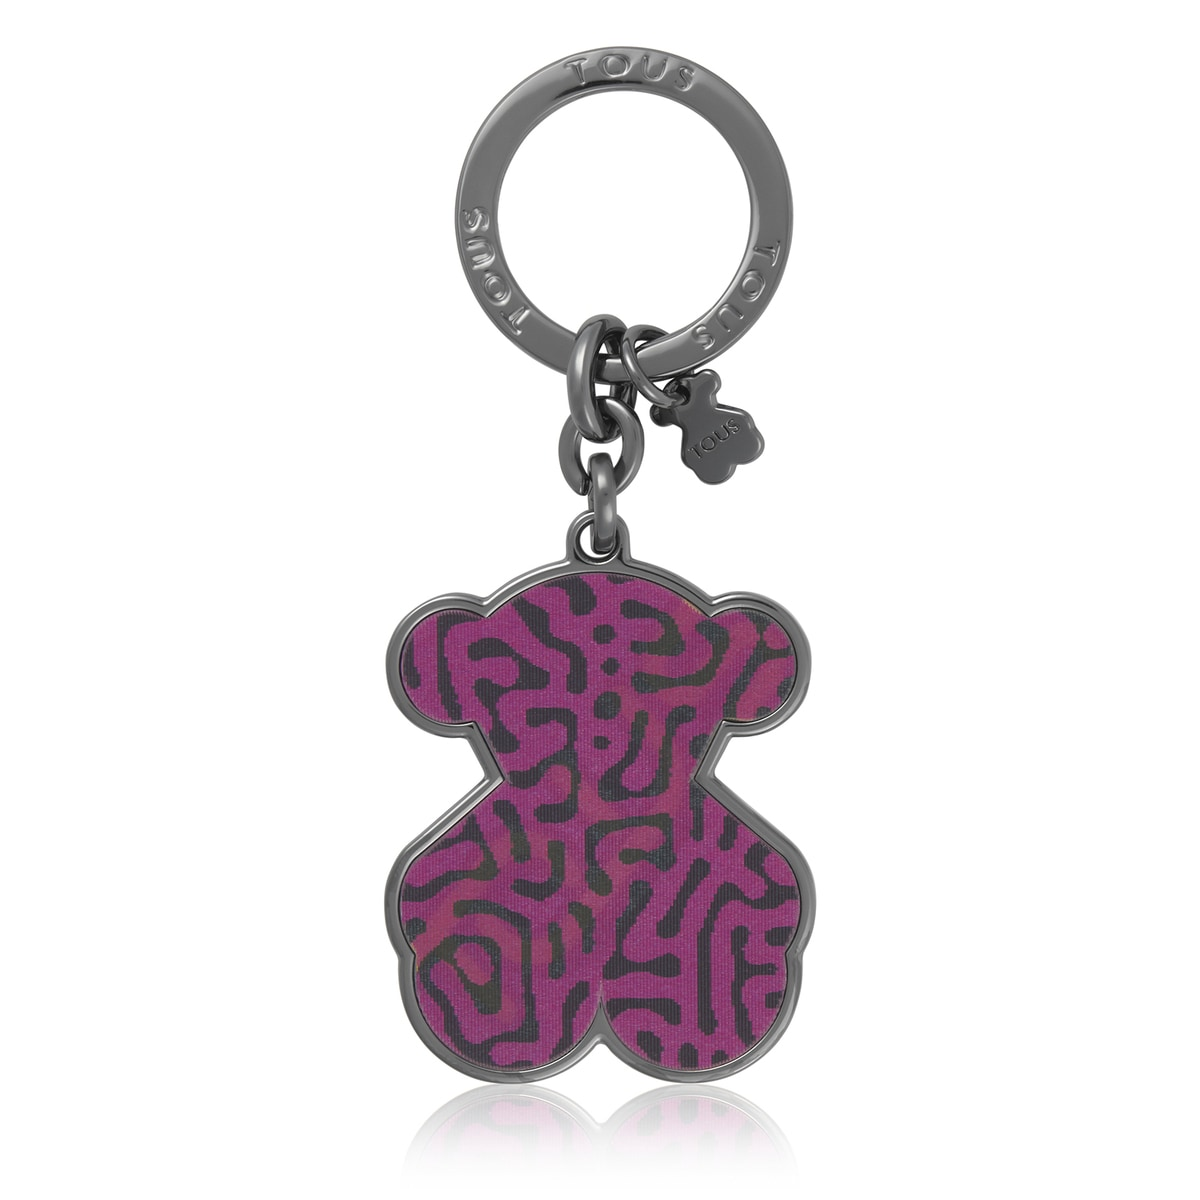 Porta-chaves Urso Lene Leo rosa e azul